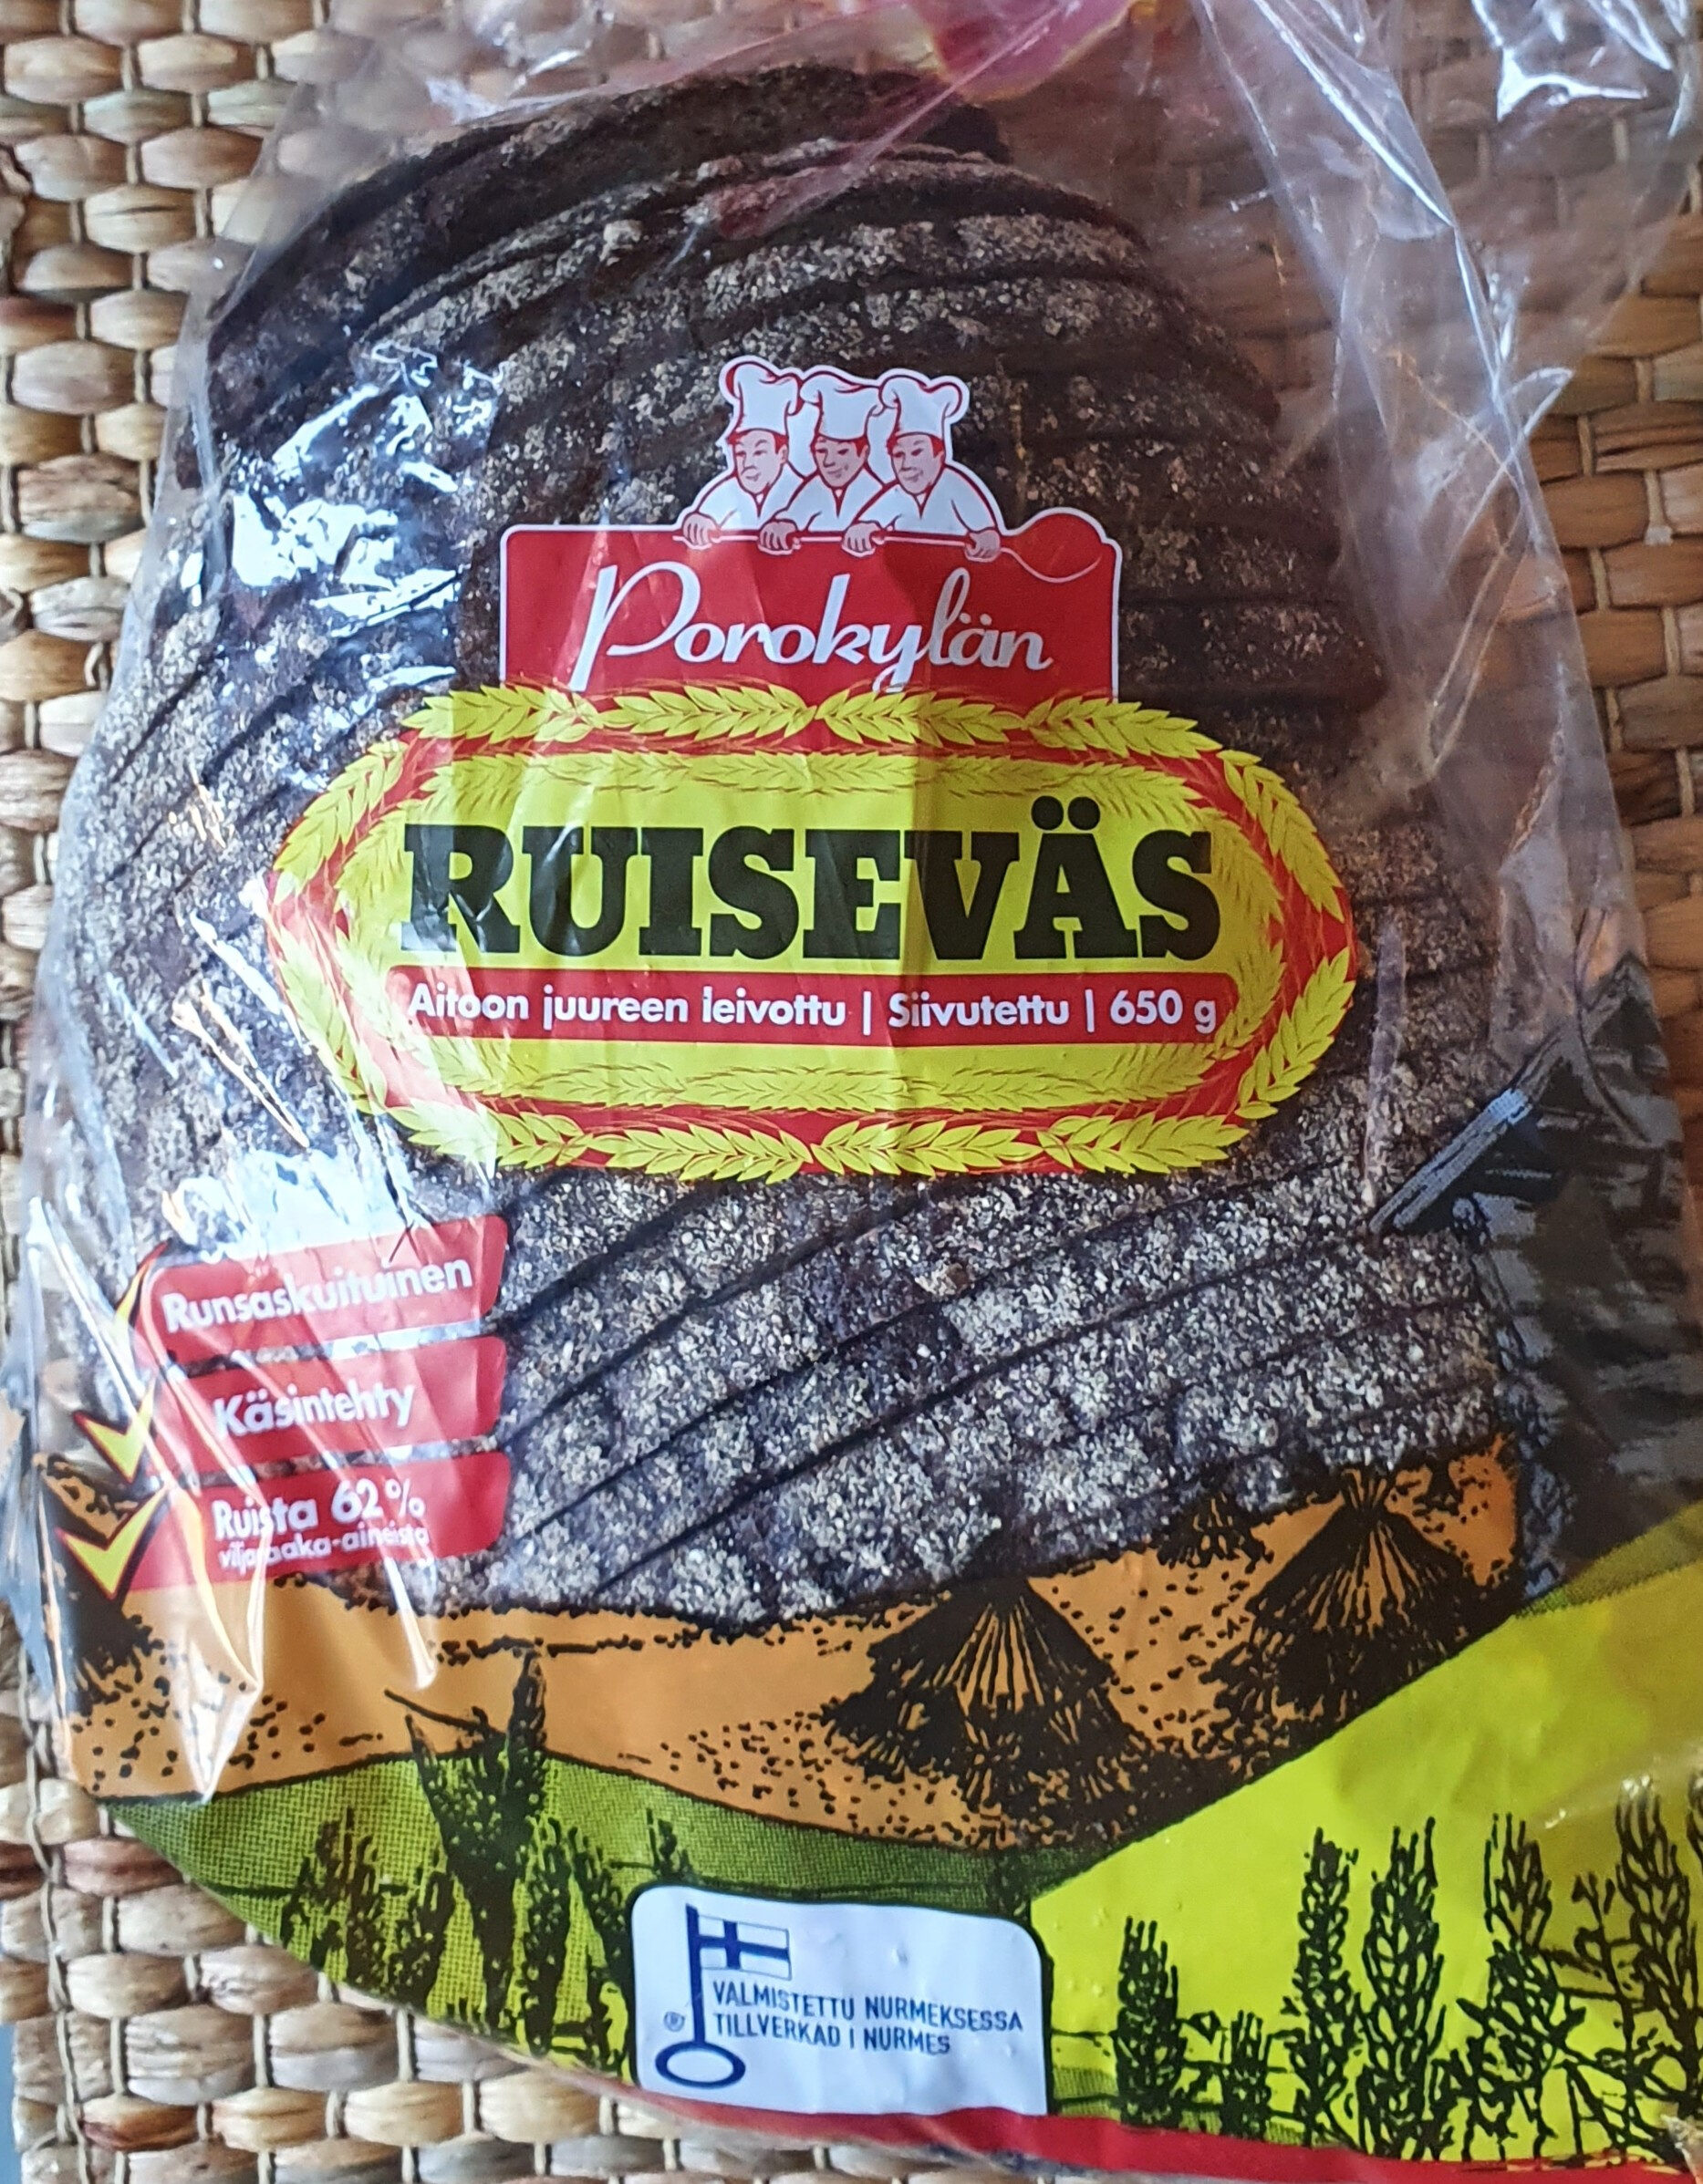 Ruiseväs - Product - fi